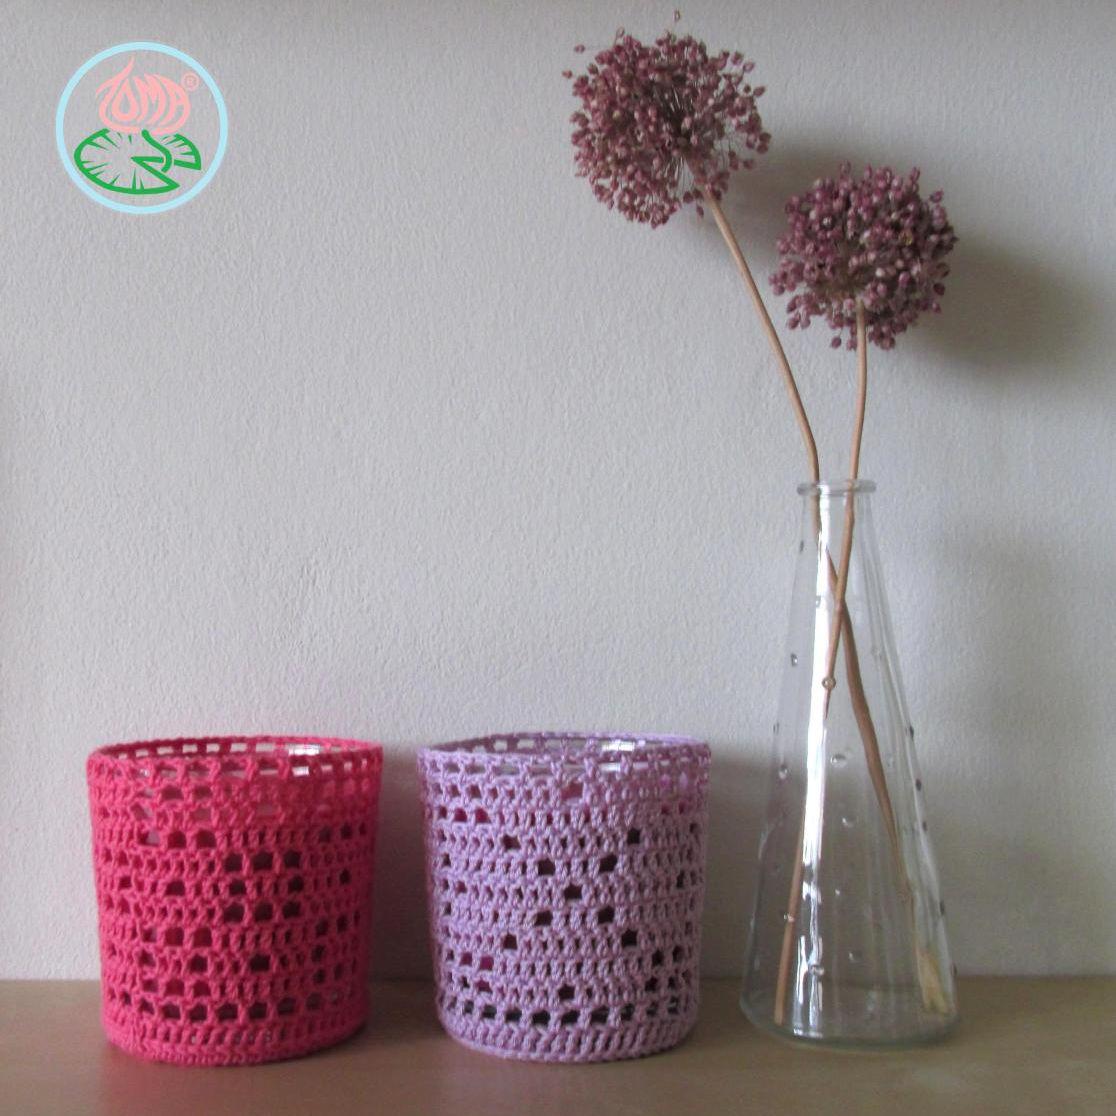 Filet Crochet Candle Cozy Patterns